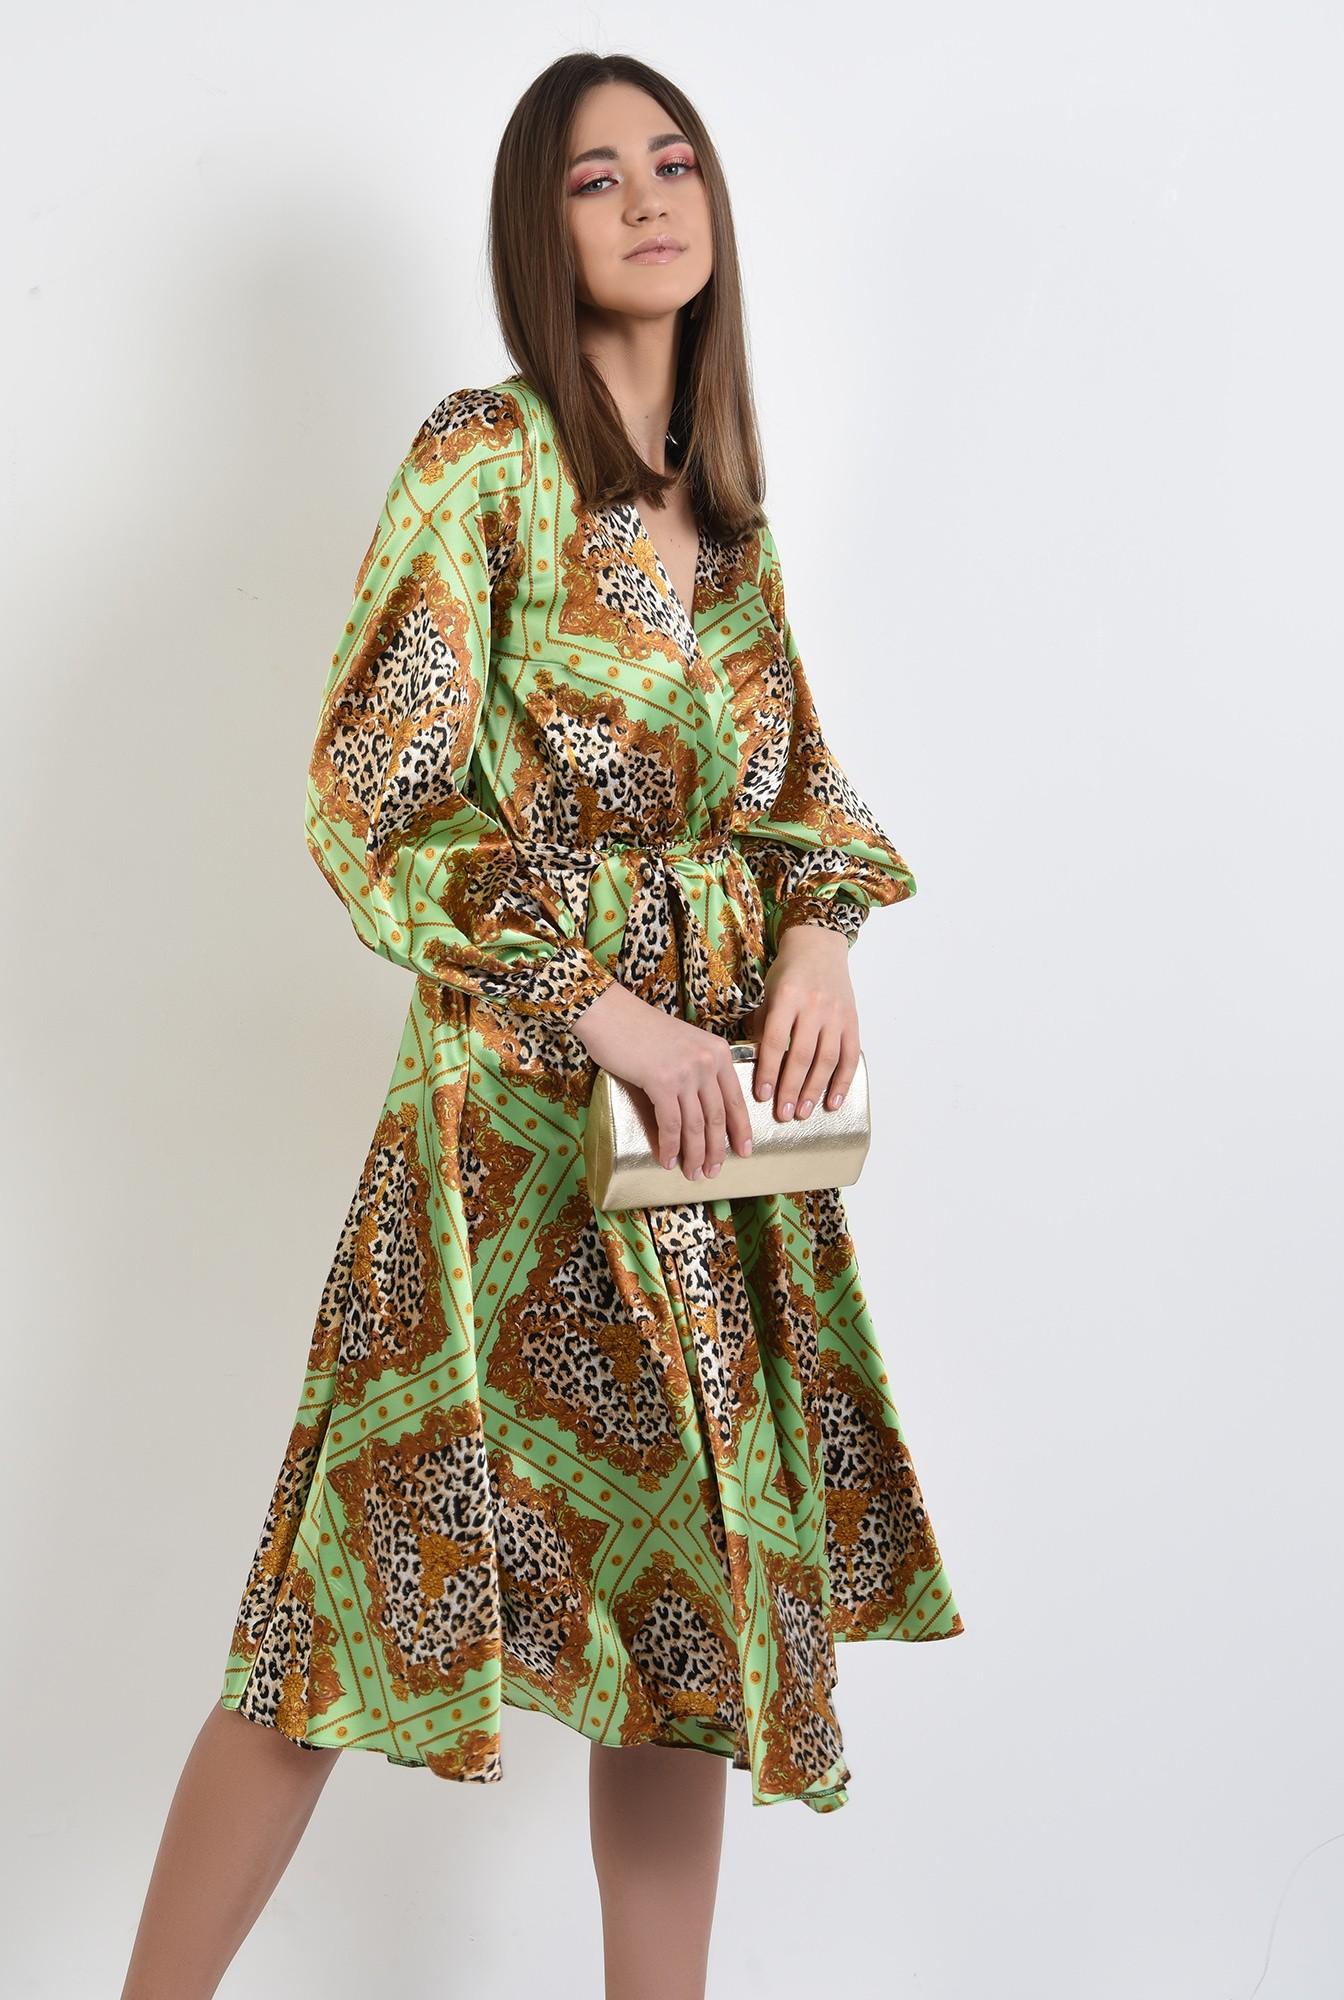 0 - 360 - rochie eleganta, din satin, cu imprimeu, maneci bufante, clos, animal print